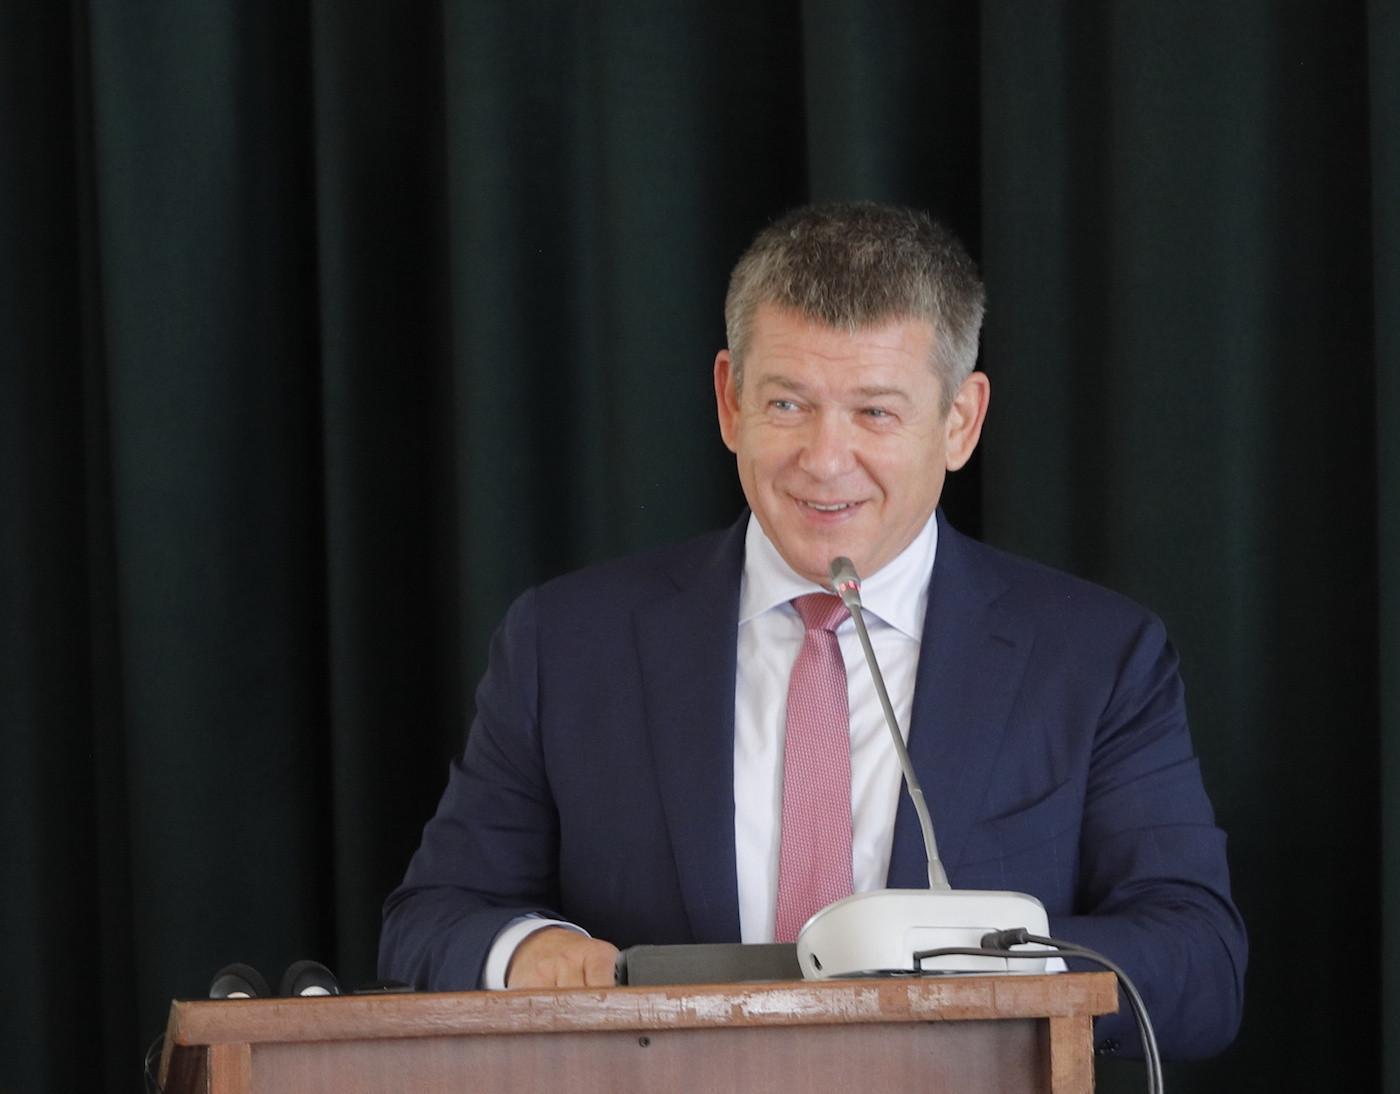 Alexander Chernov, director general of the Yekaterinburg bid, ran through their plans for the 2023 Summer Universiade ©FISU